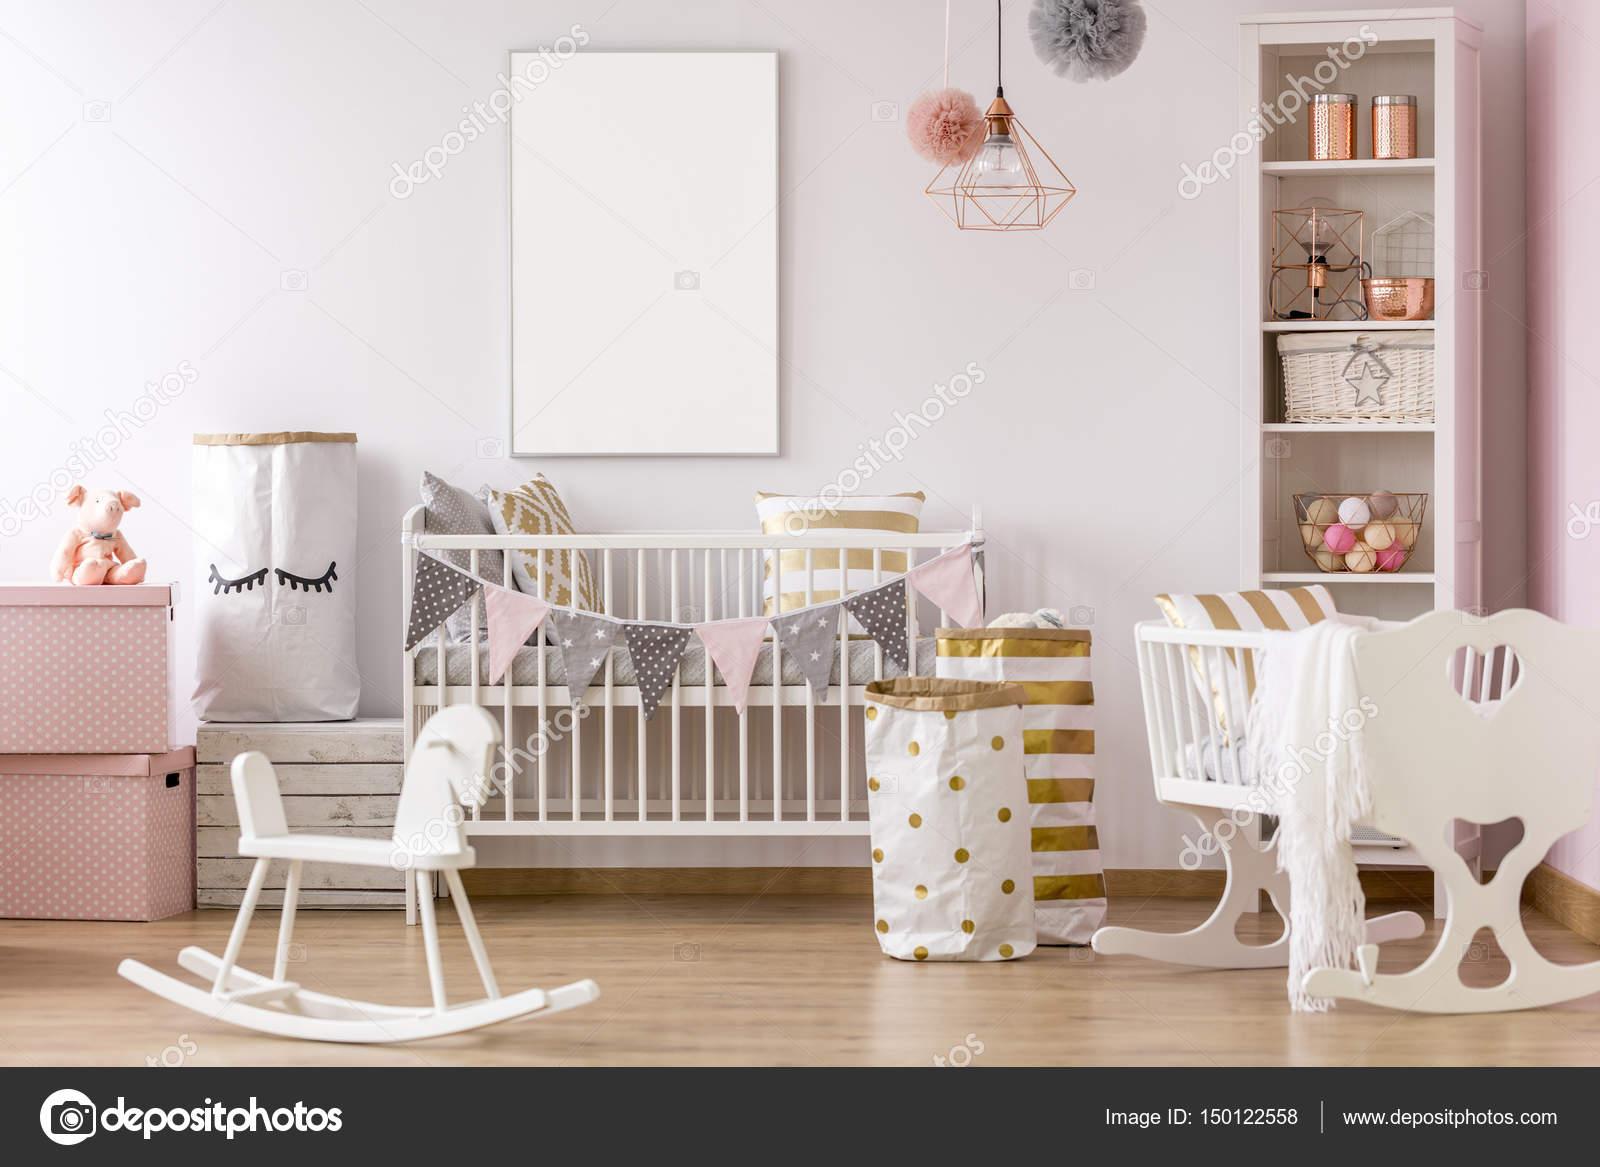 Weiss Rosa Babyzimmer Stockfoto C Photographee Eu 150122558